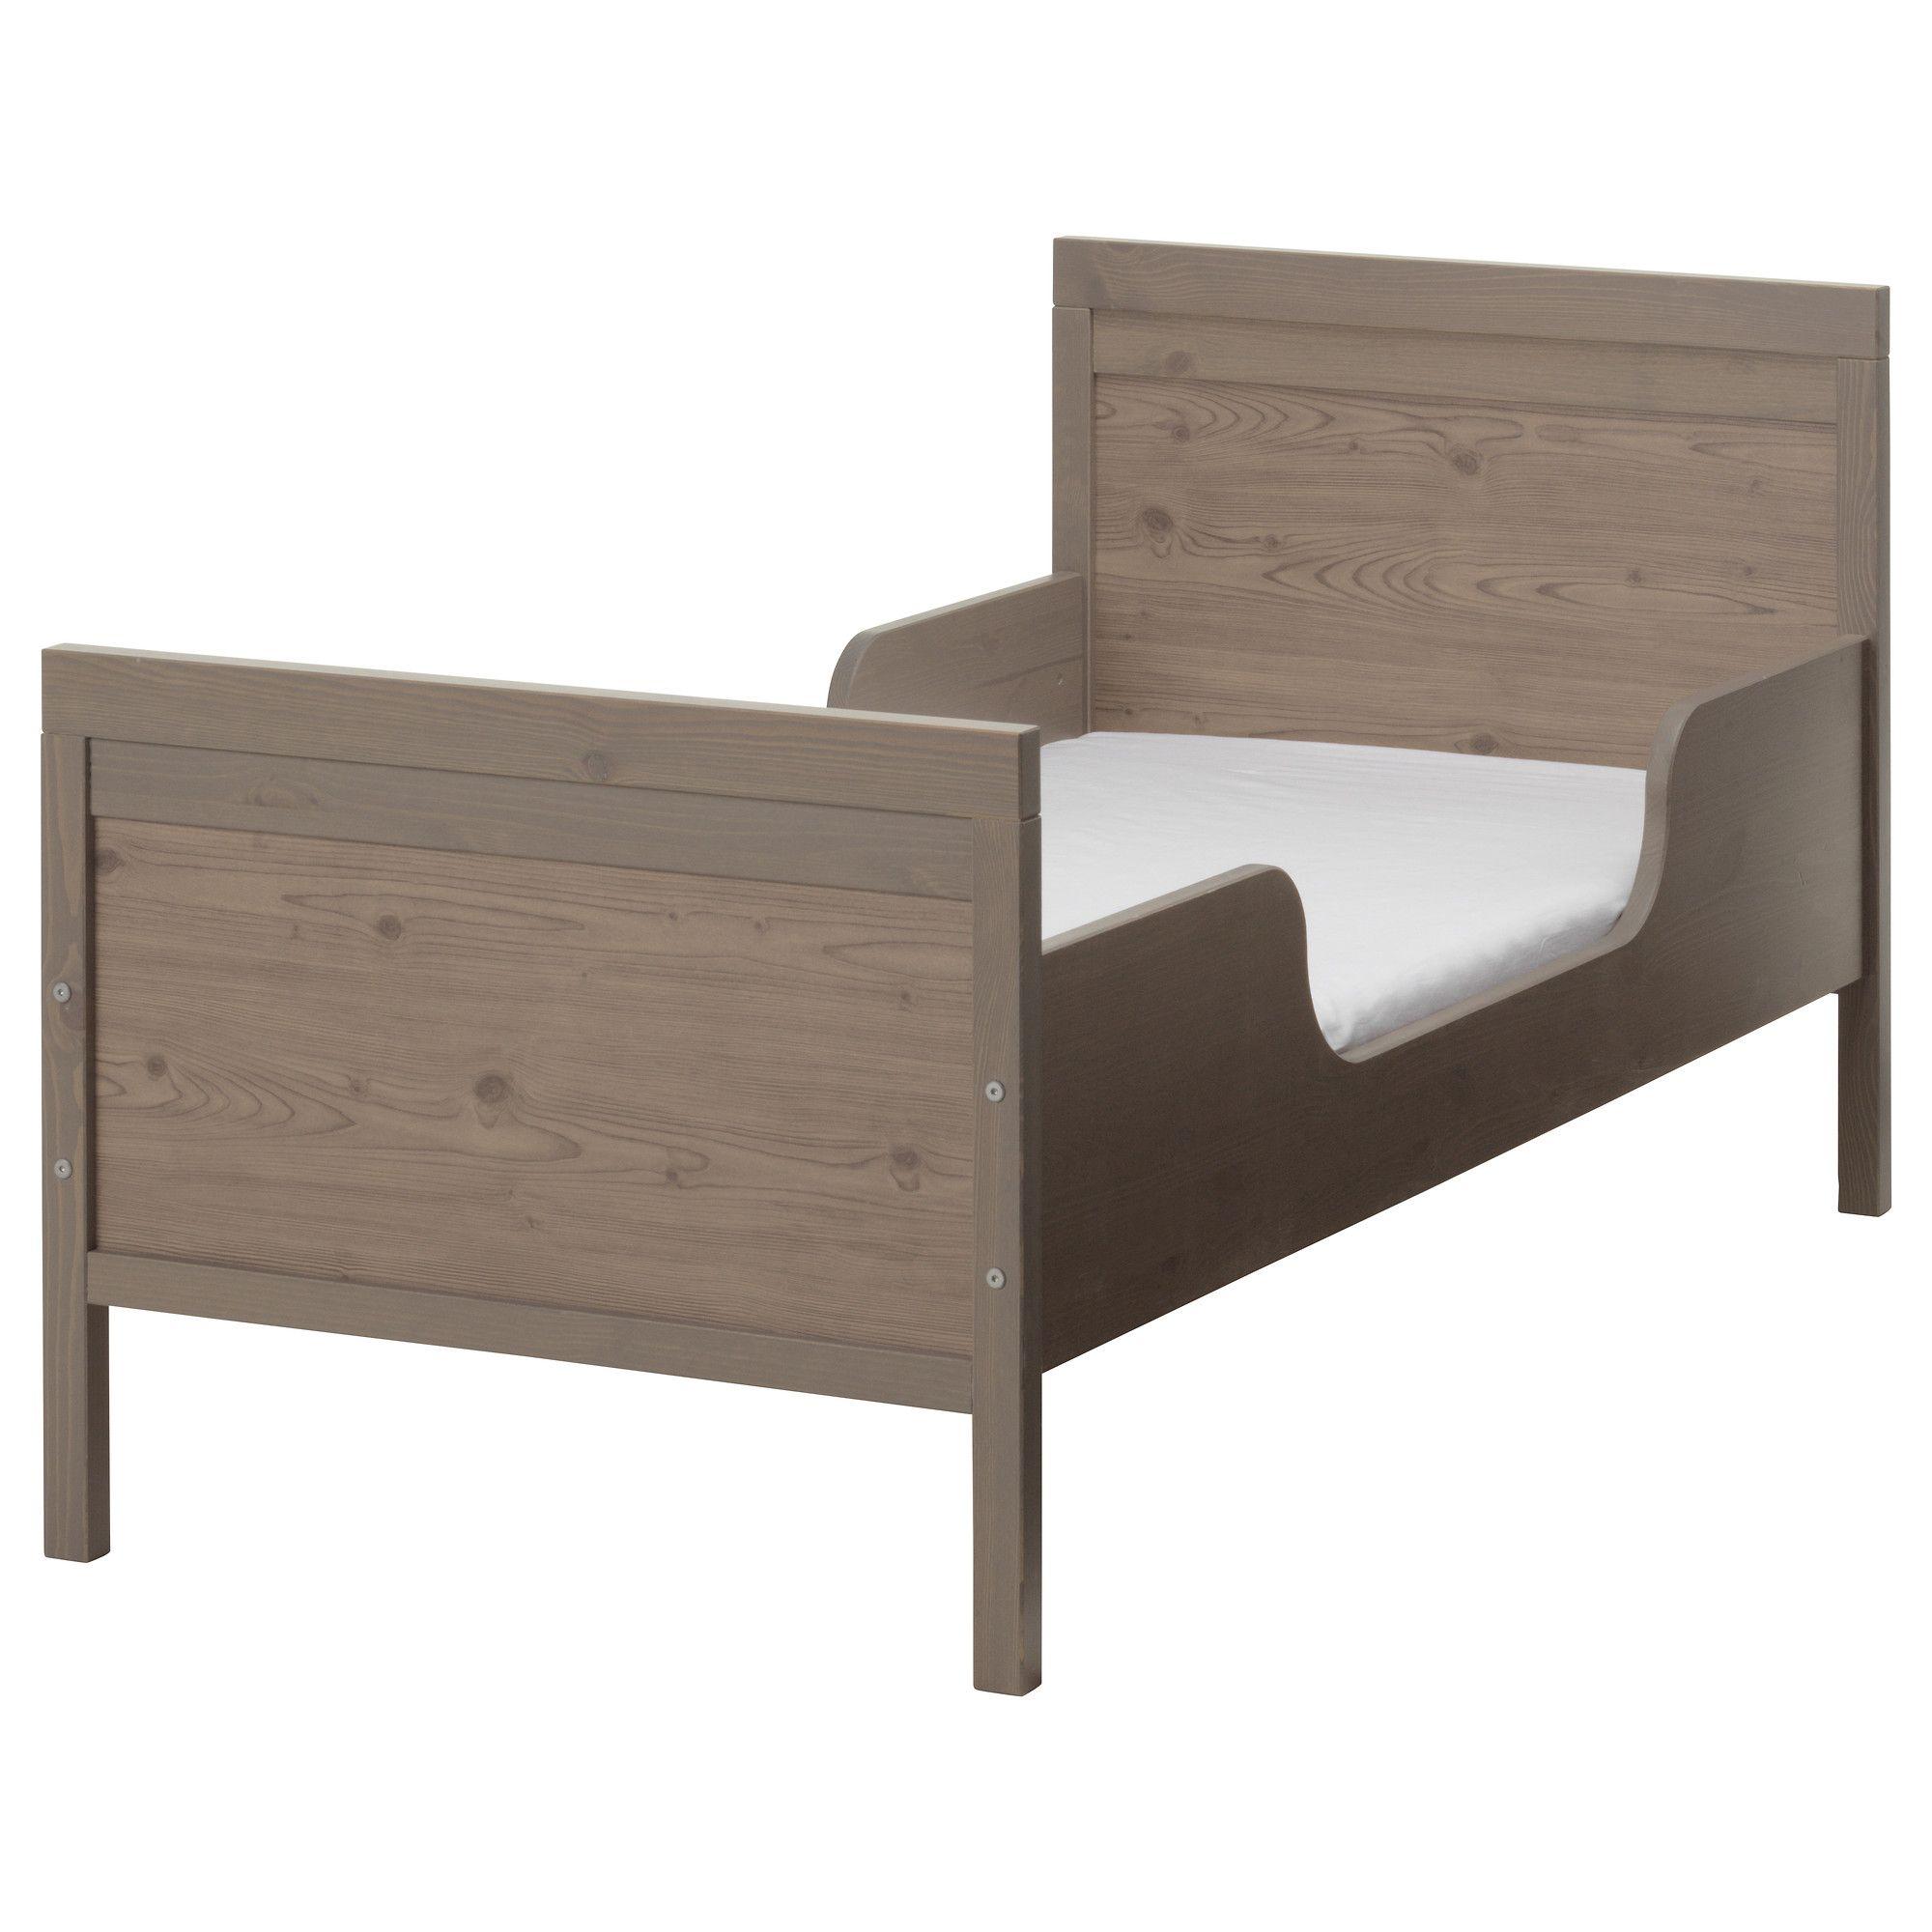 SUNDVIK Estructura de cama con somier - IKEA | Decoración ...